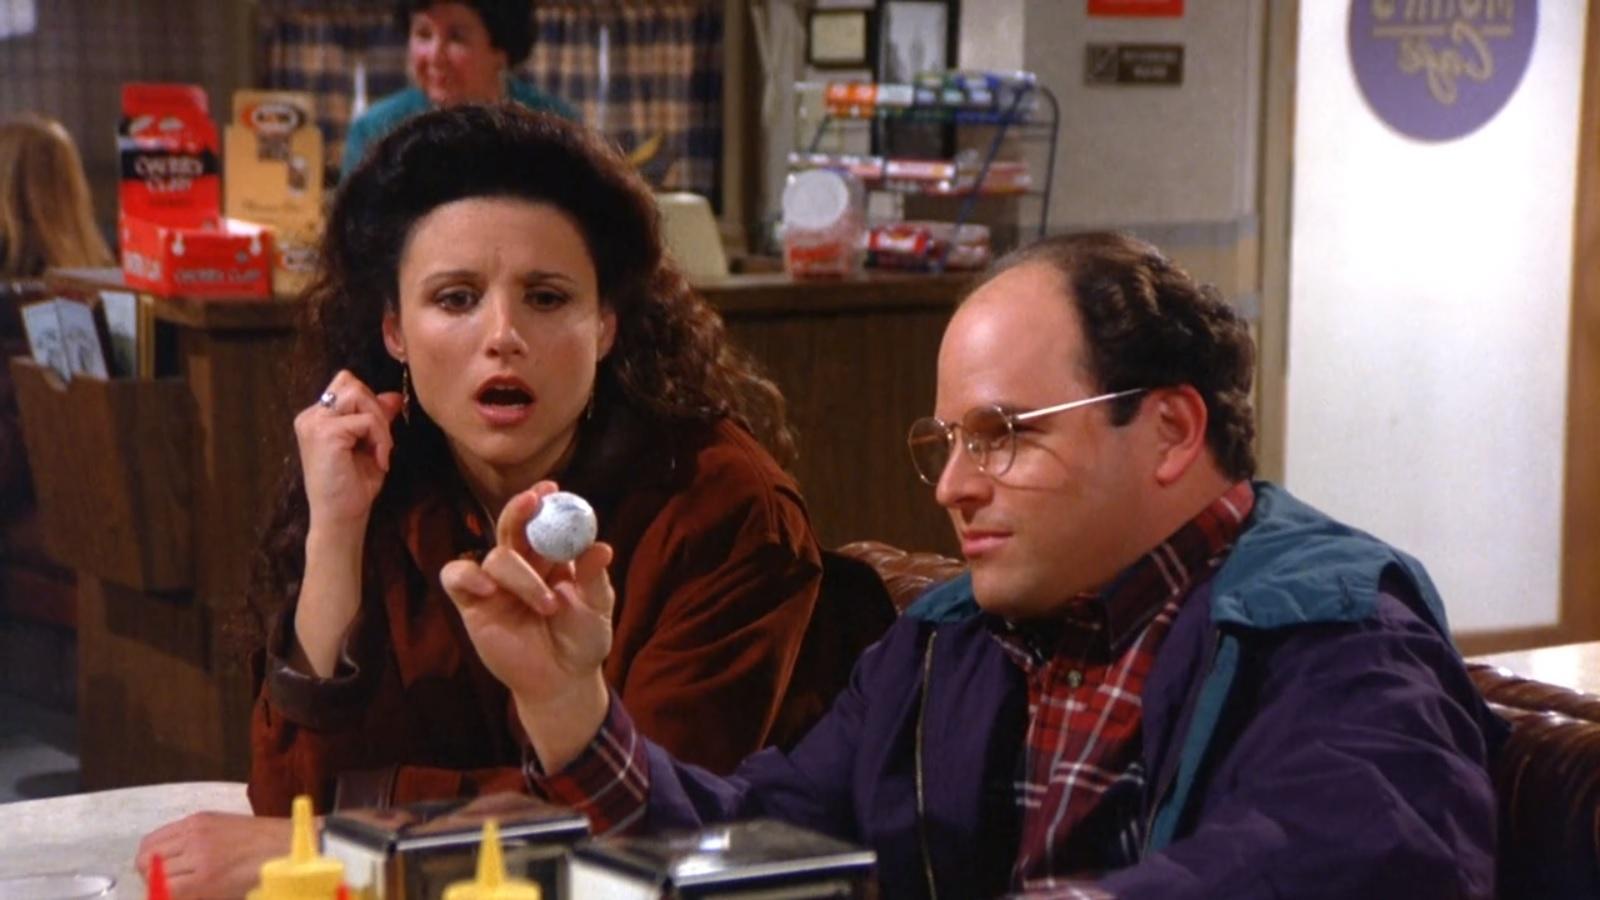 Seinfeld - Part Two - Understanding seinfeldwith bigrams